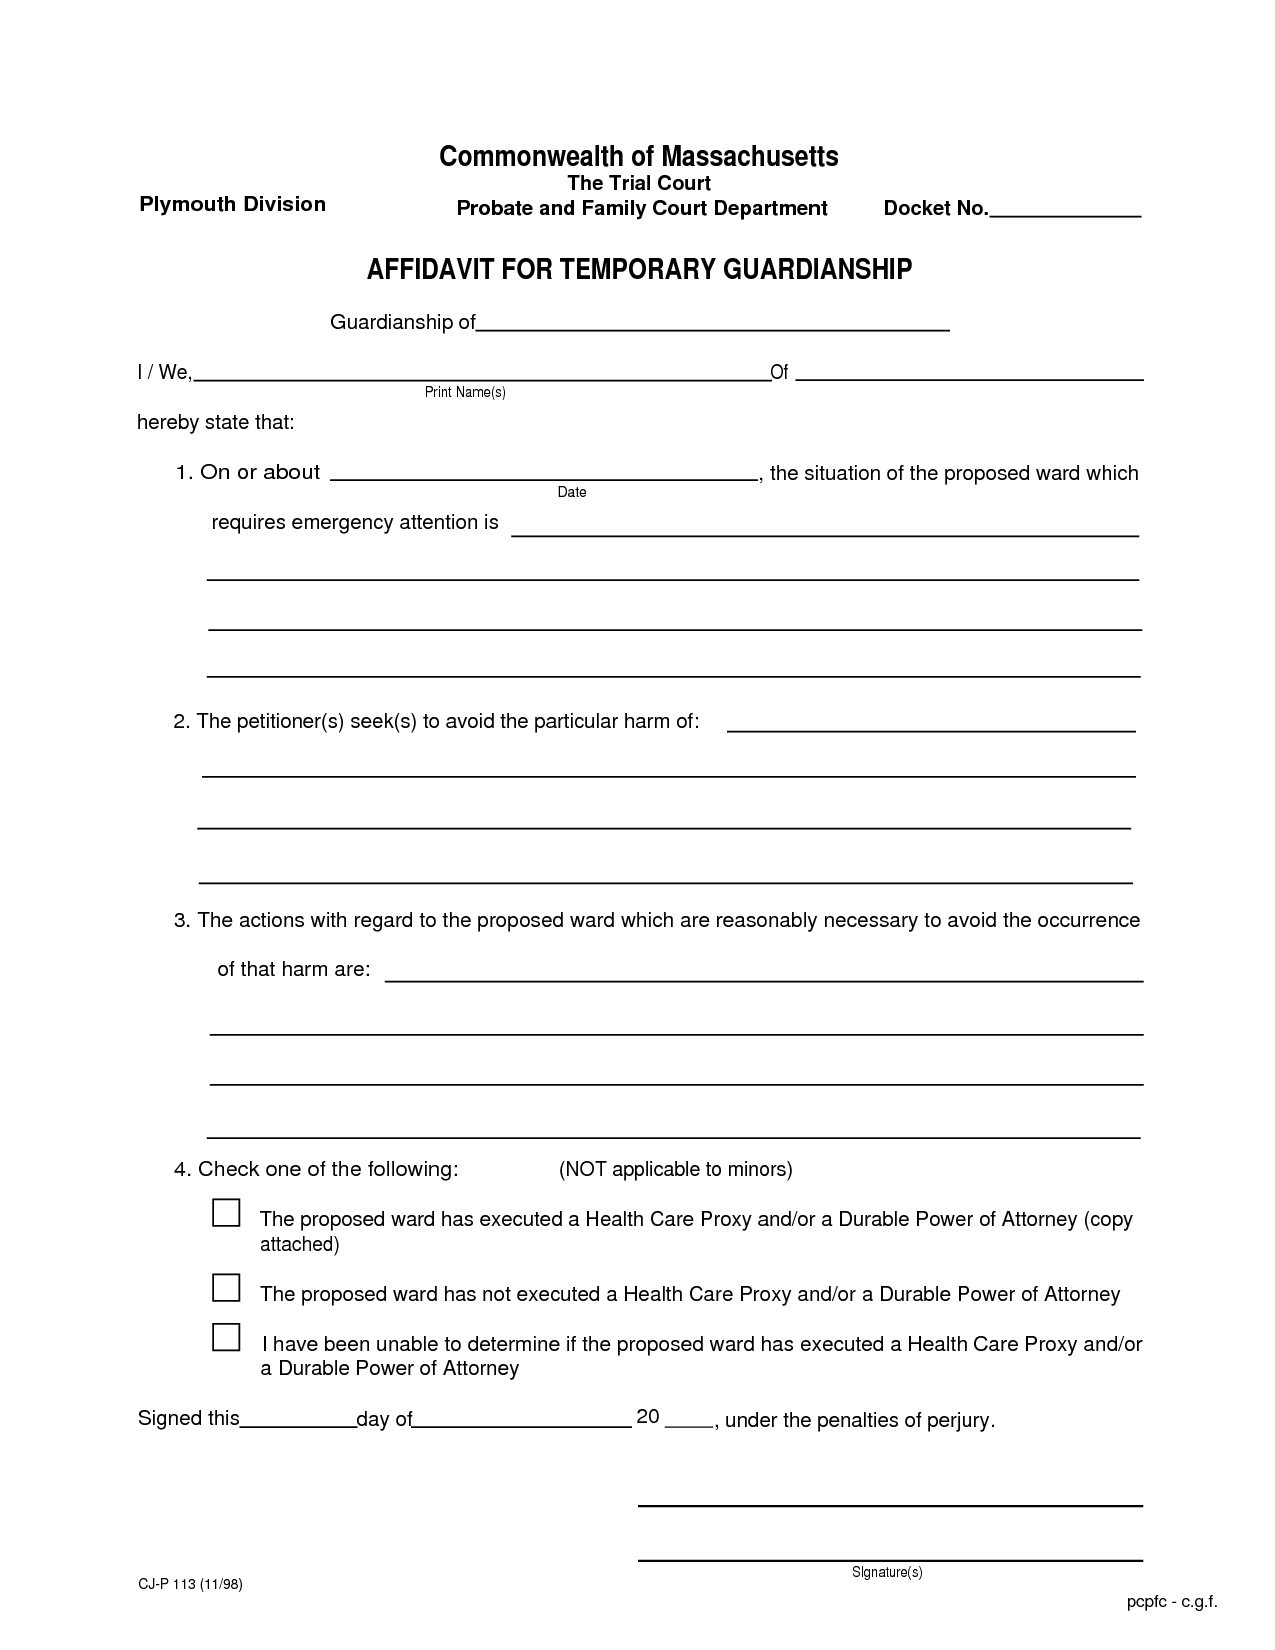 Legal Temporary Child Custody Agreement Form - Id97998 Opendata - Free Printable Temporary Guardianship Form